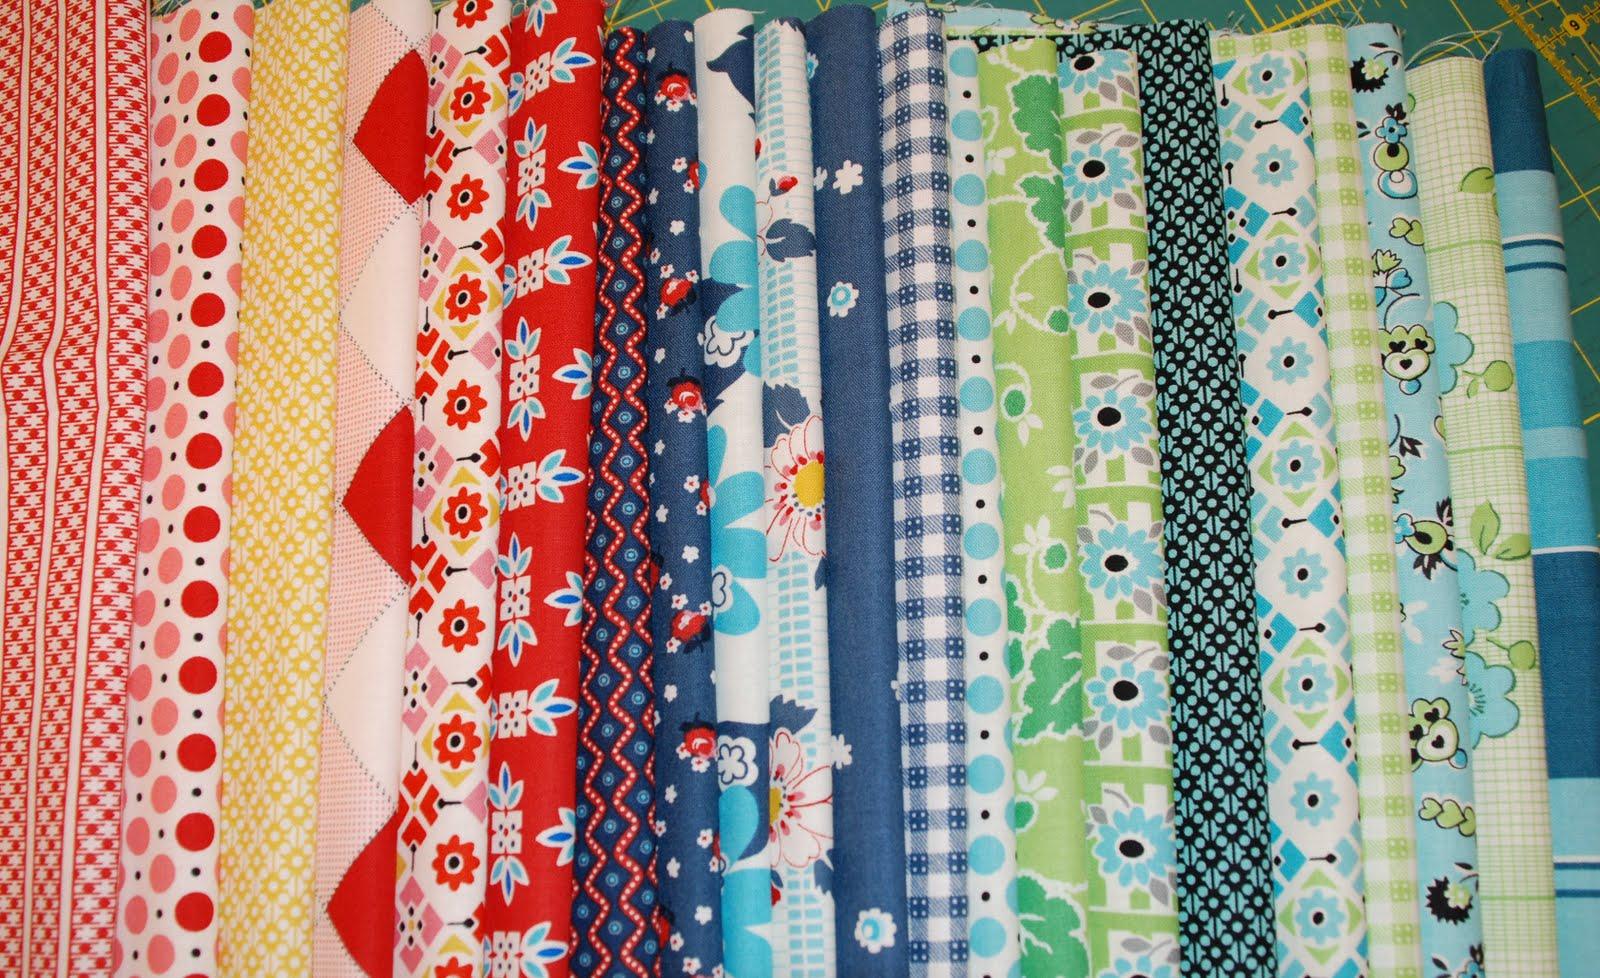 Jo ann fabric joann crafts stores location joann for Joann craft store near me